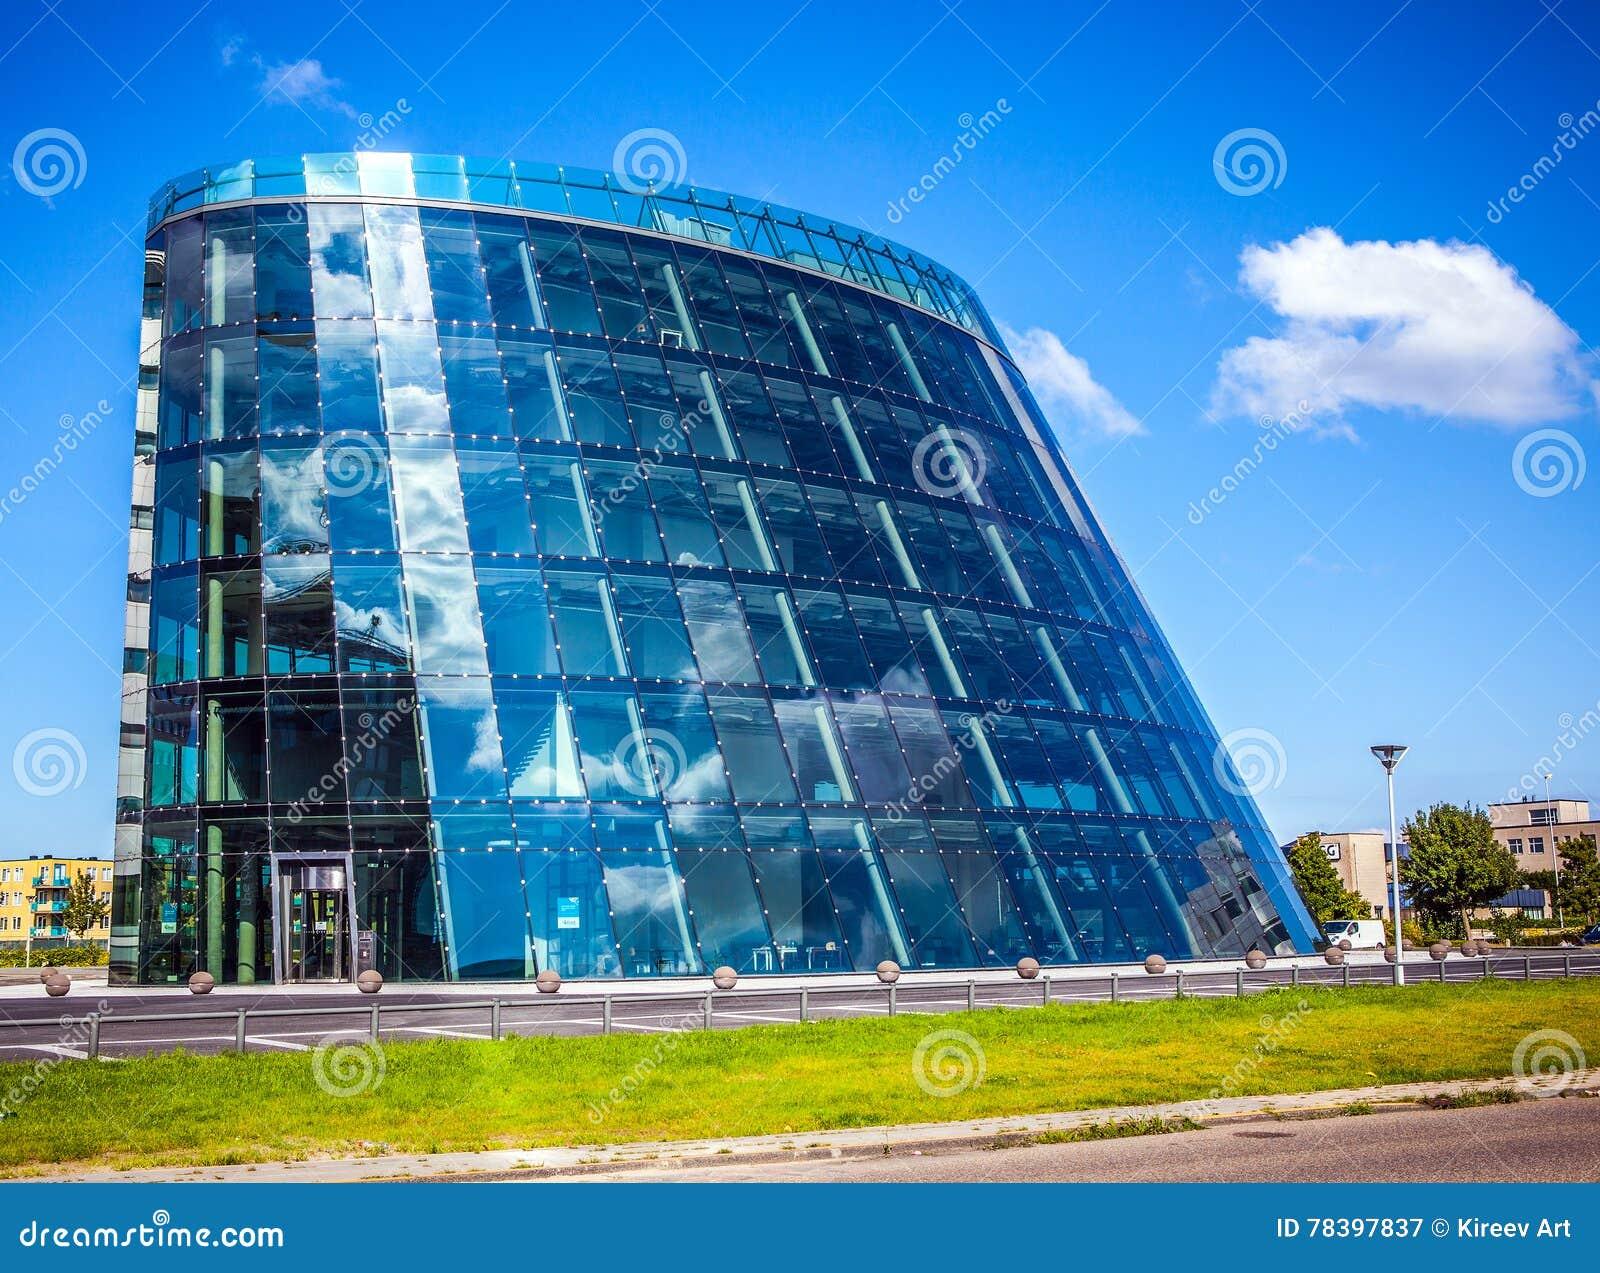 AMSTERDAM, NEDERLAND - AUGUSTUS 15, 2016: Moderne stadsarchitectuur Commercieel centrum met bureaus 15 augustus, 2016